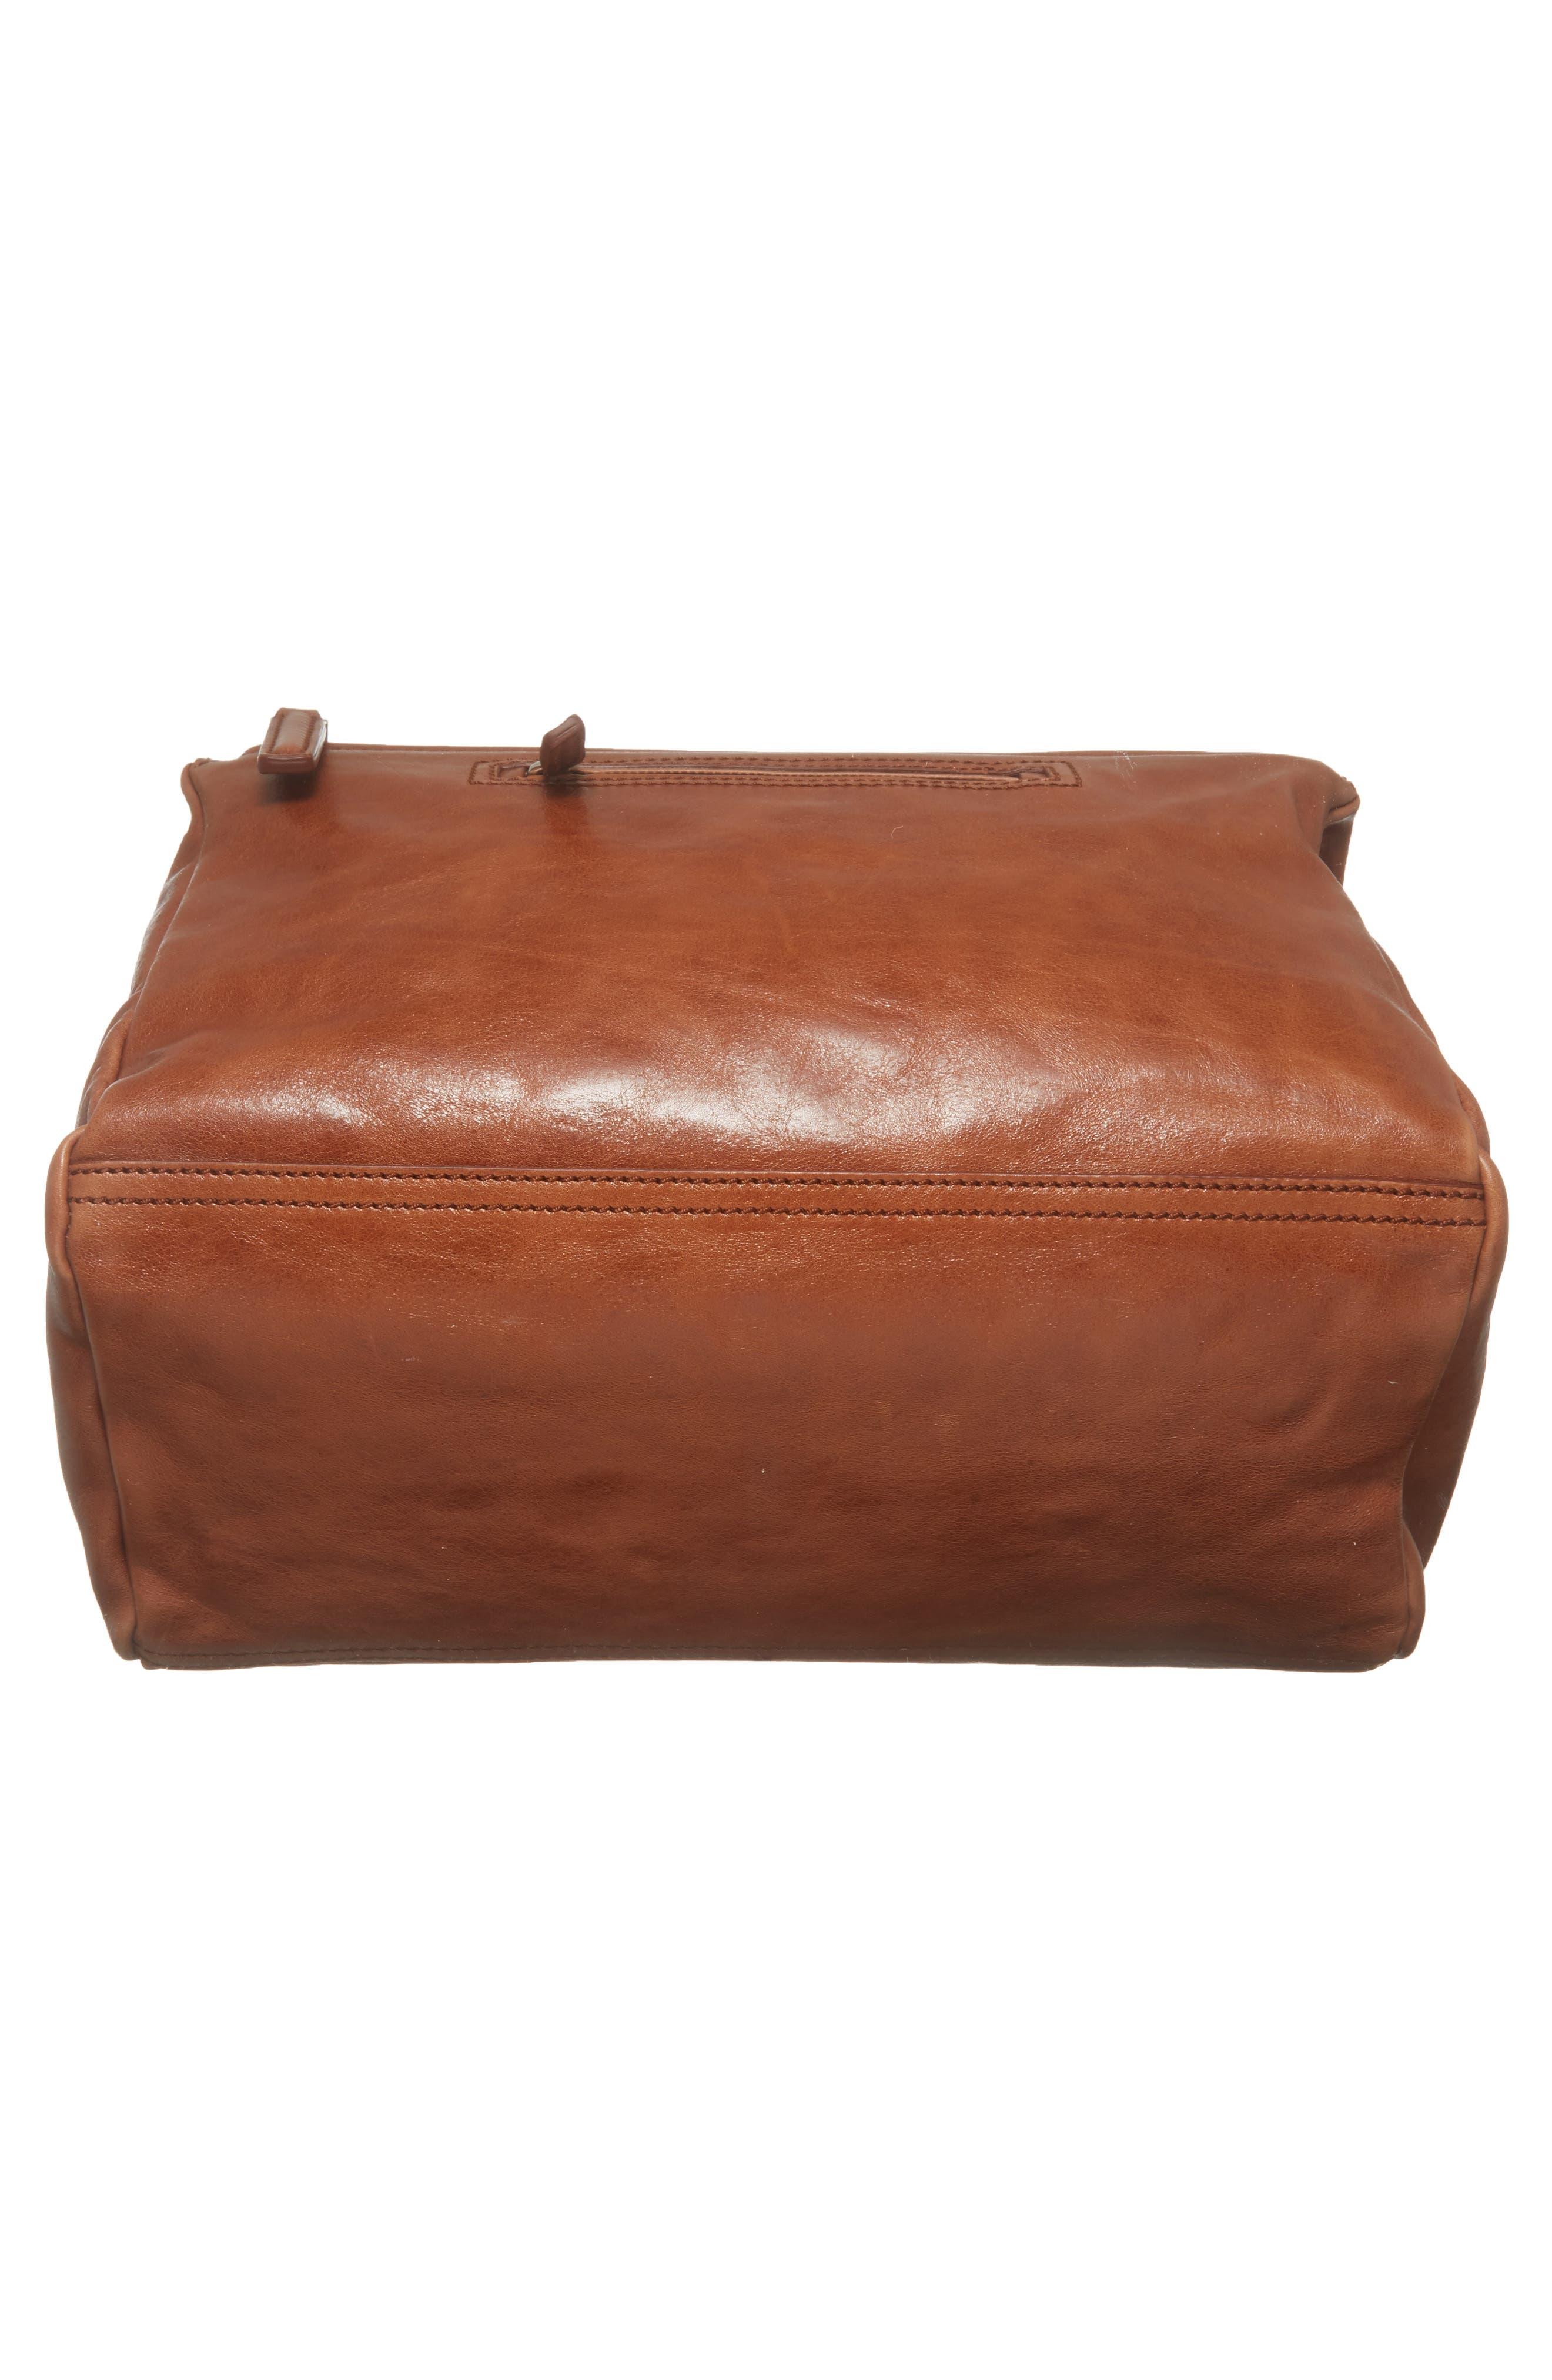 Medium Pandora Shiny Aged Leather Satchel,                             Alternate thumbnail 6, color,                             Cognac